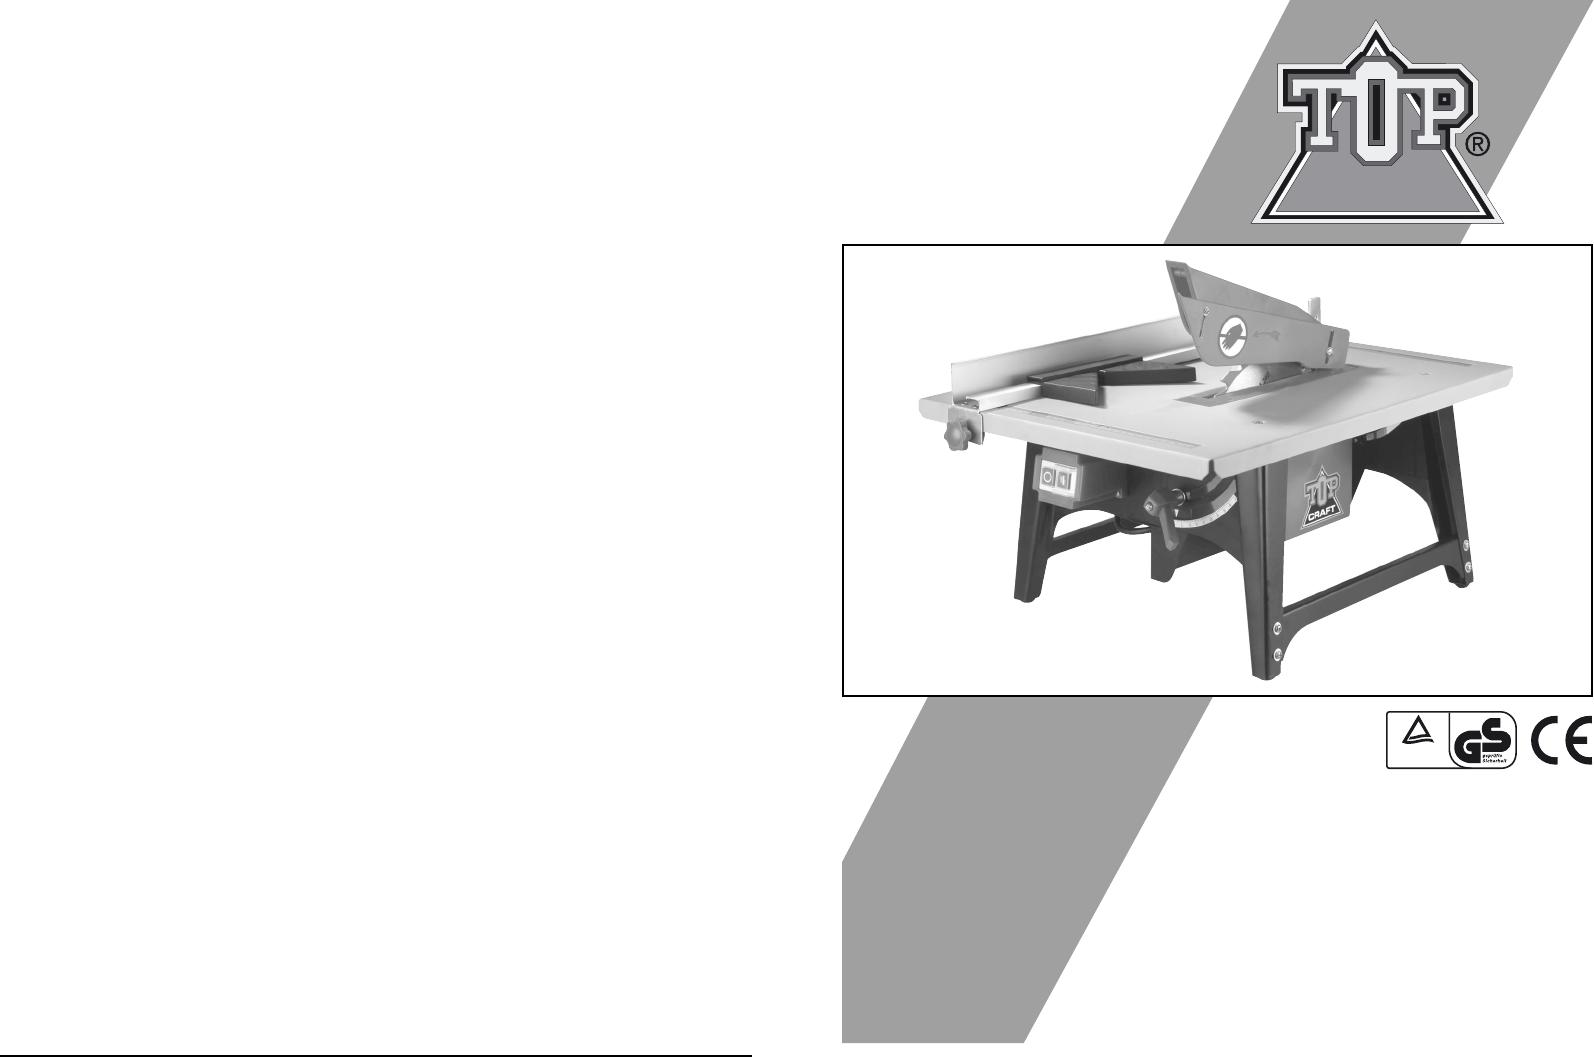 Bedienungsanleitung topcraft tbs 205 1000 tsm6008 seite - Top craft scie circulaire table ...